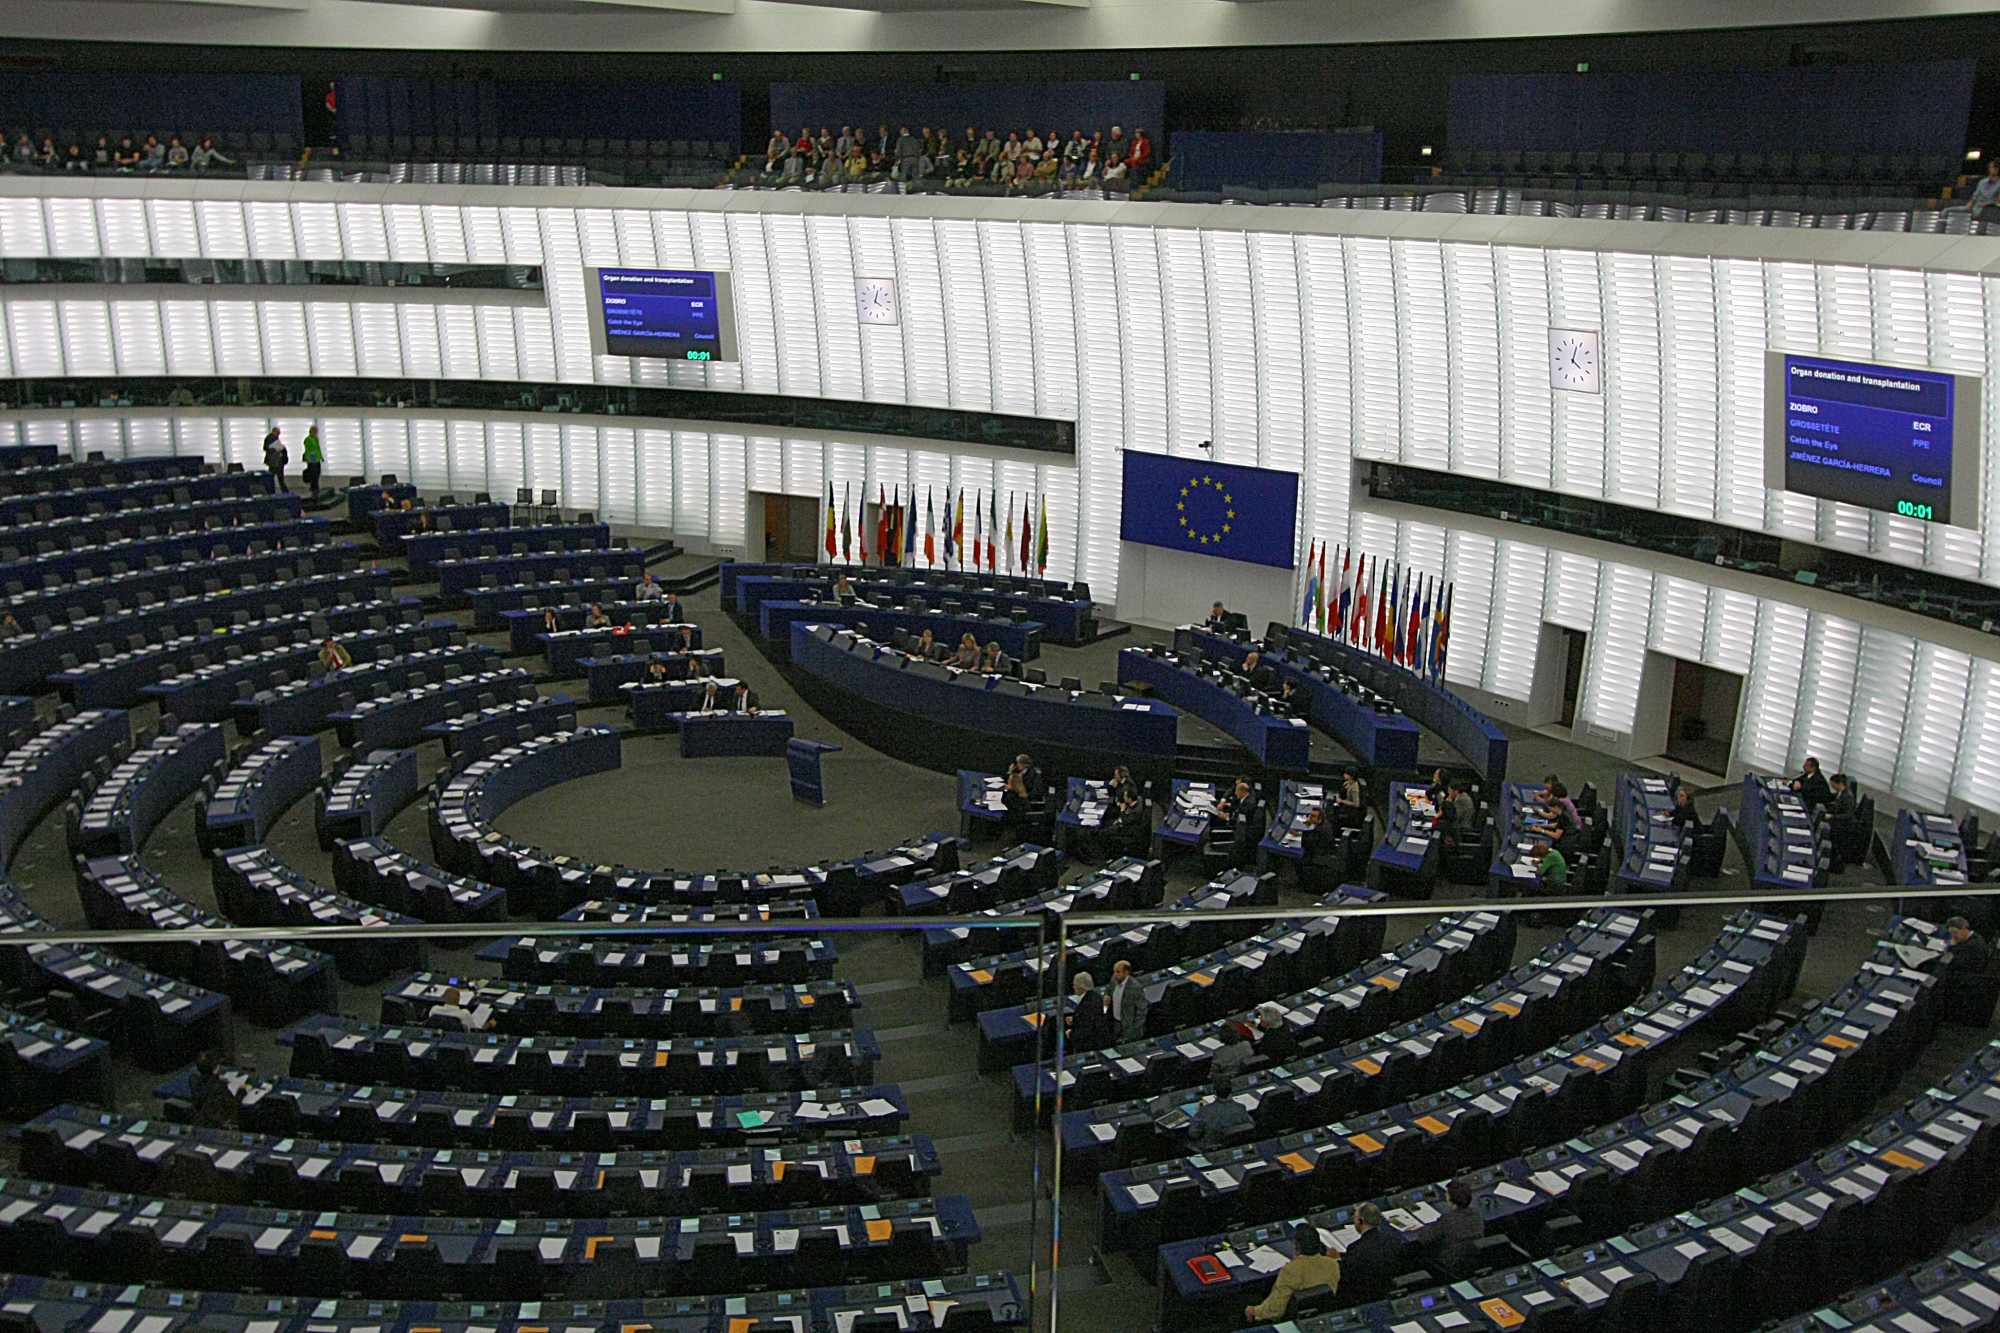 Plenarsaal des EU-Parlamentes in Straßburg. CC BY 2.0, via Wikimedia/jeffowenphotos